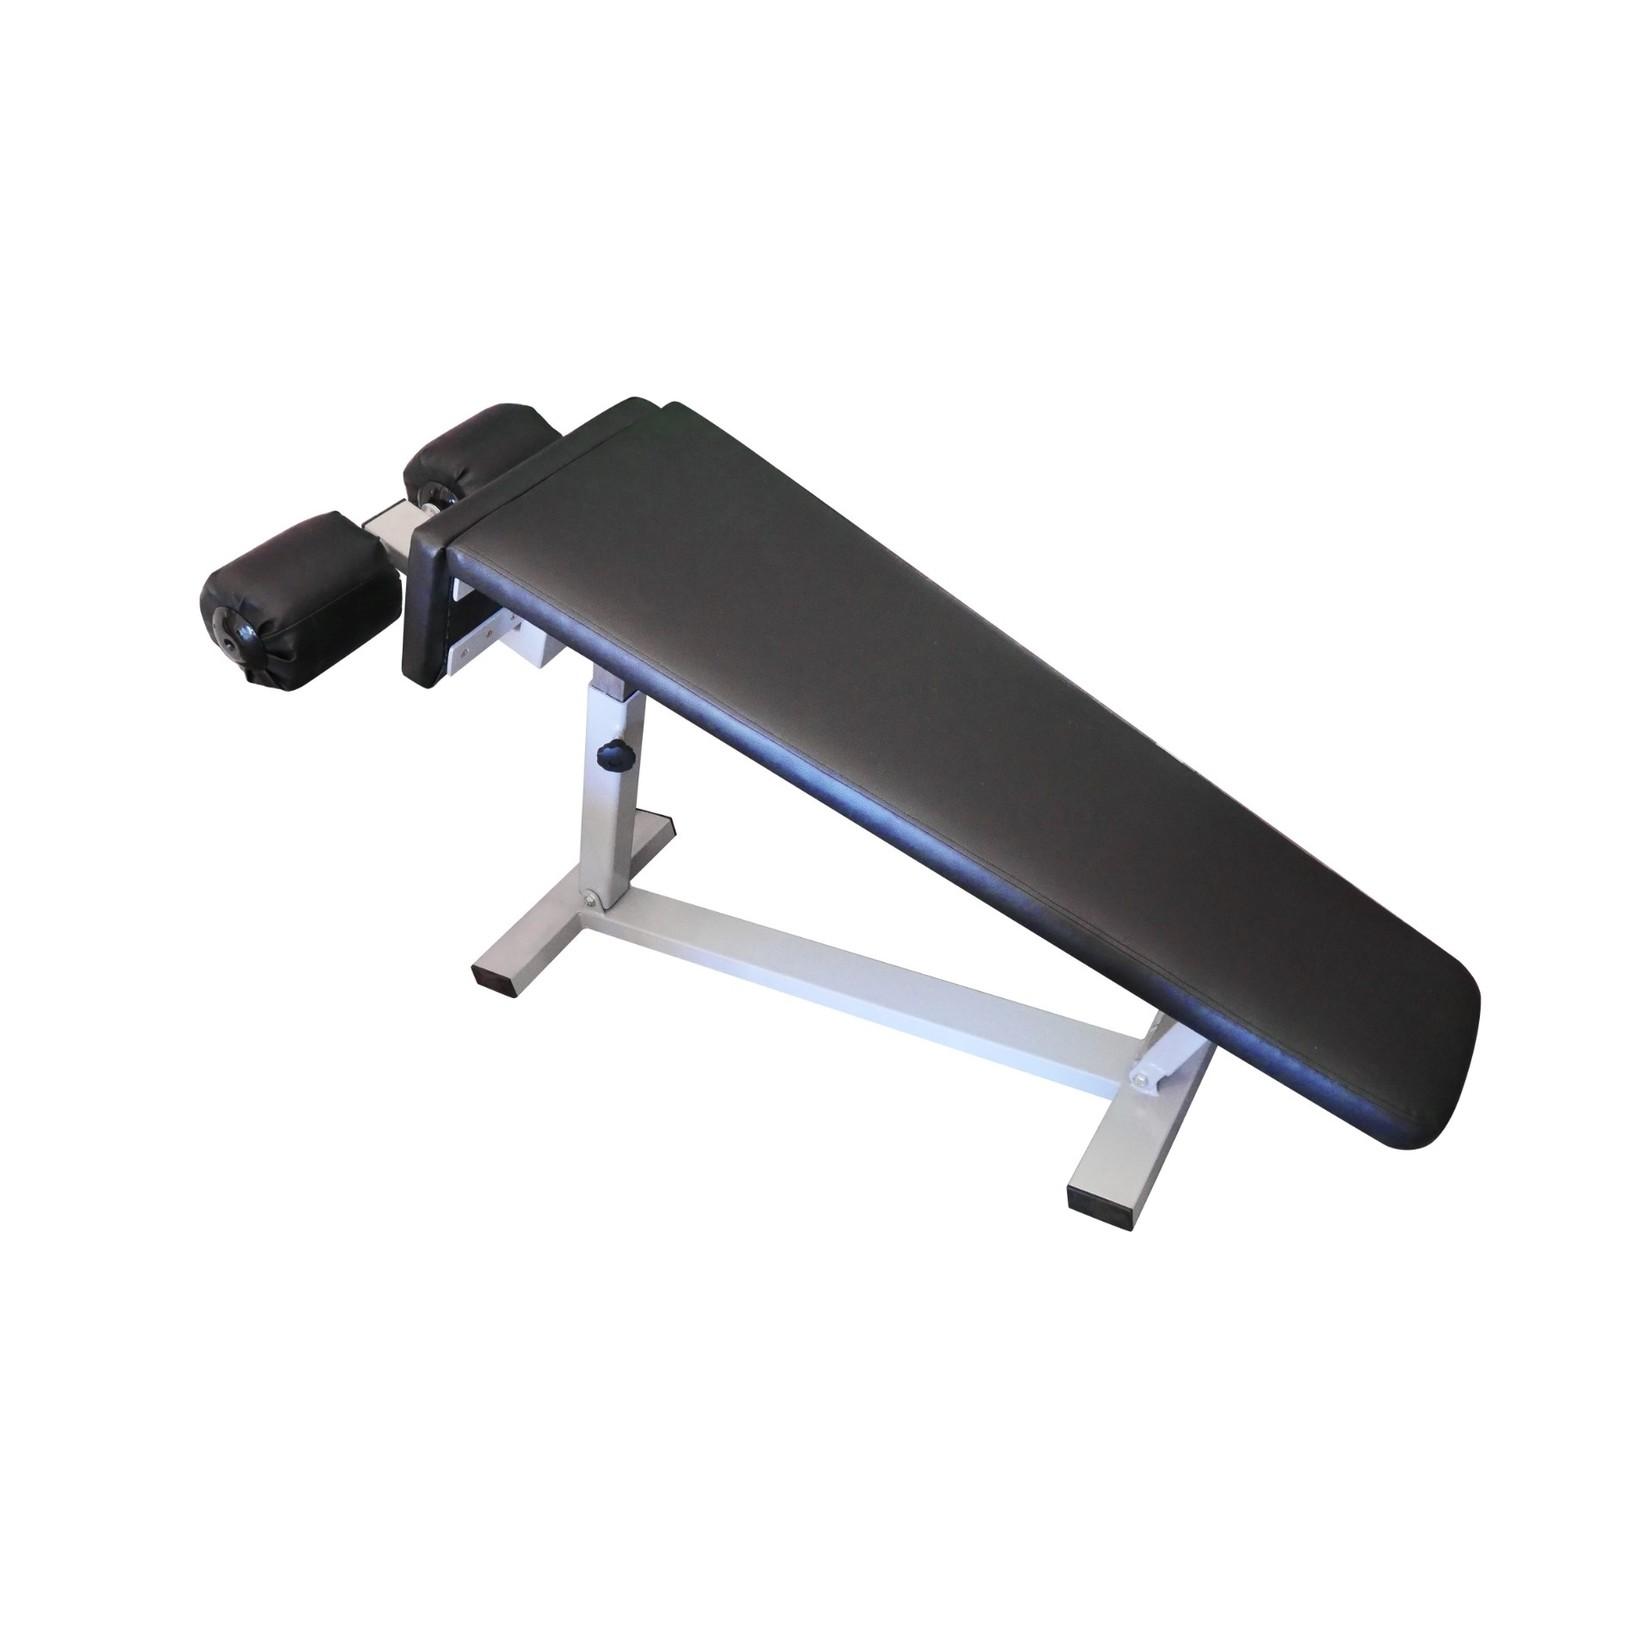 Sit Up/ Ab Crunch Bench 1E